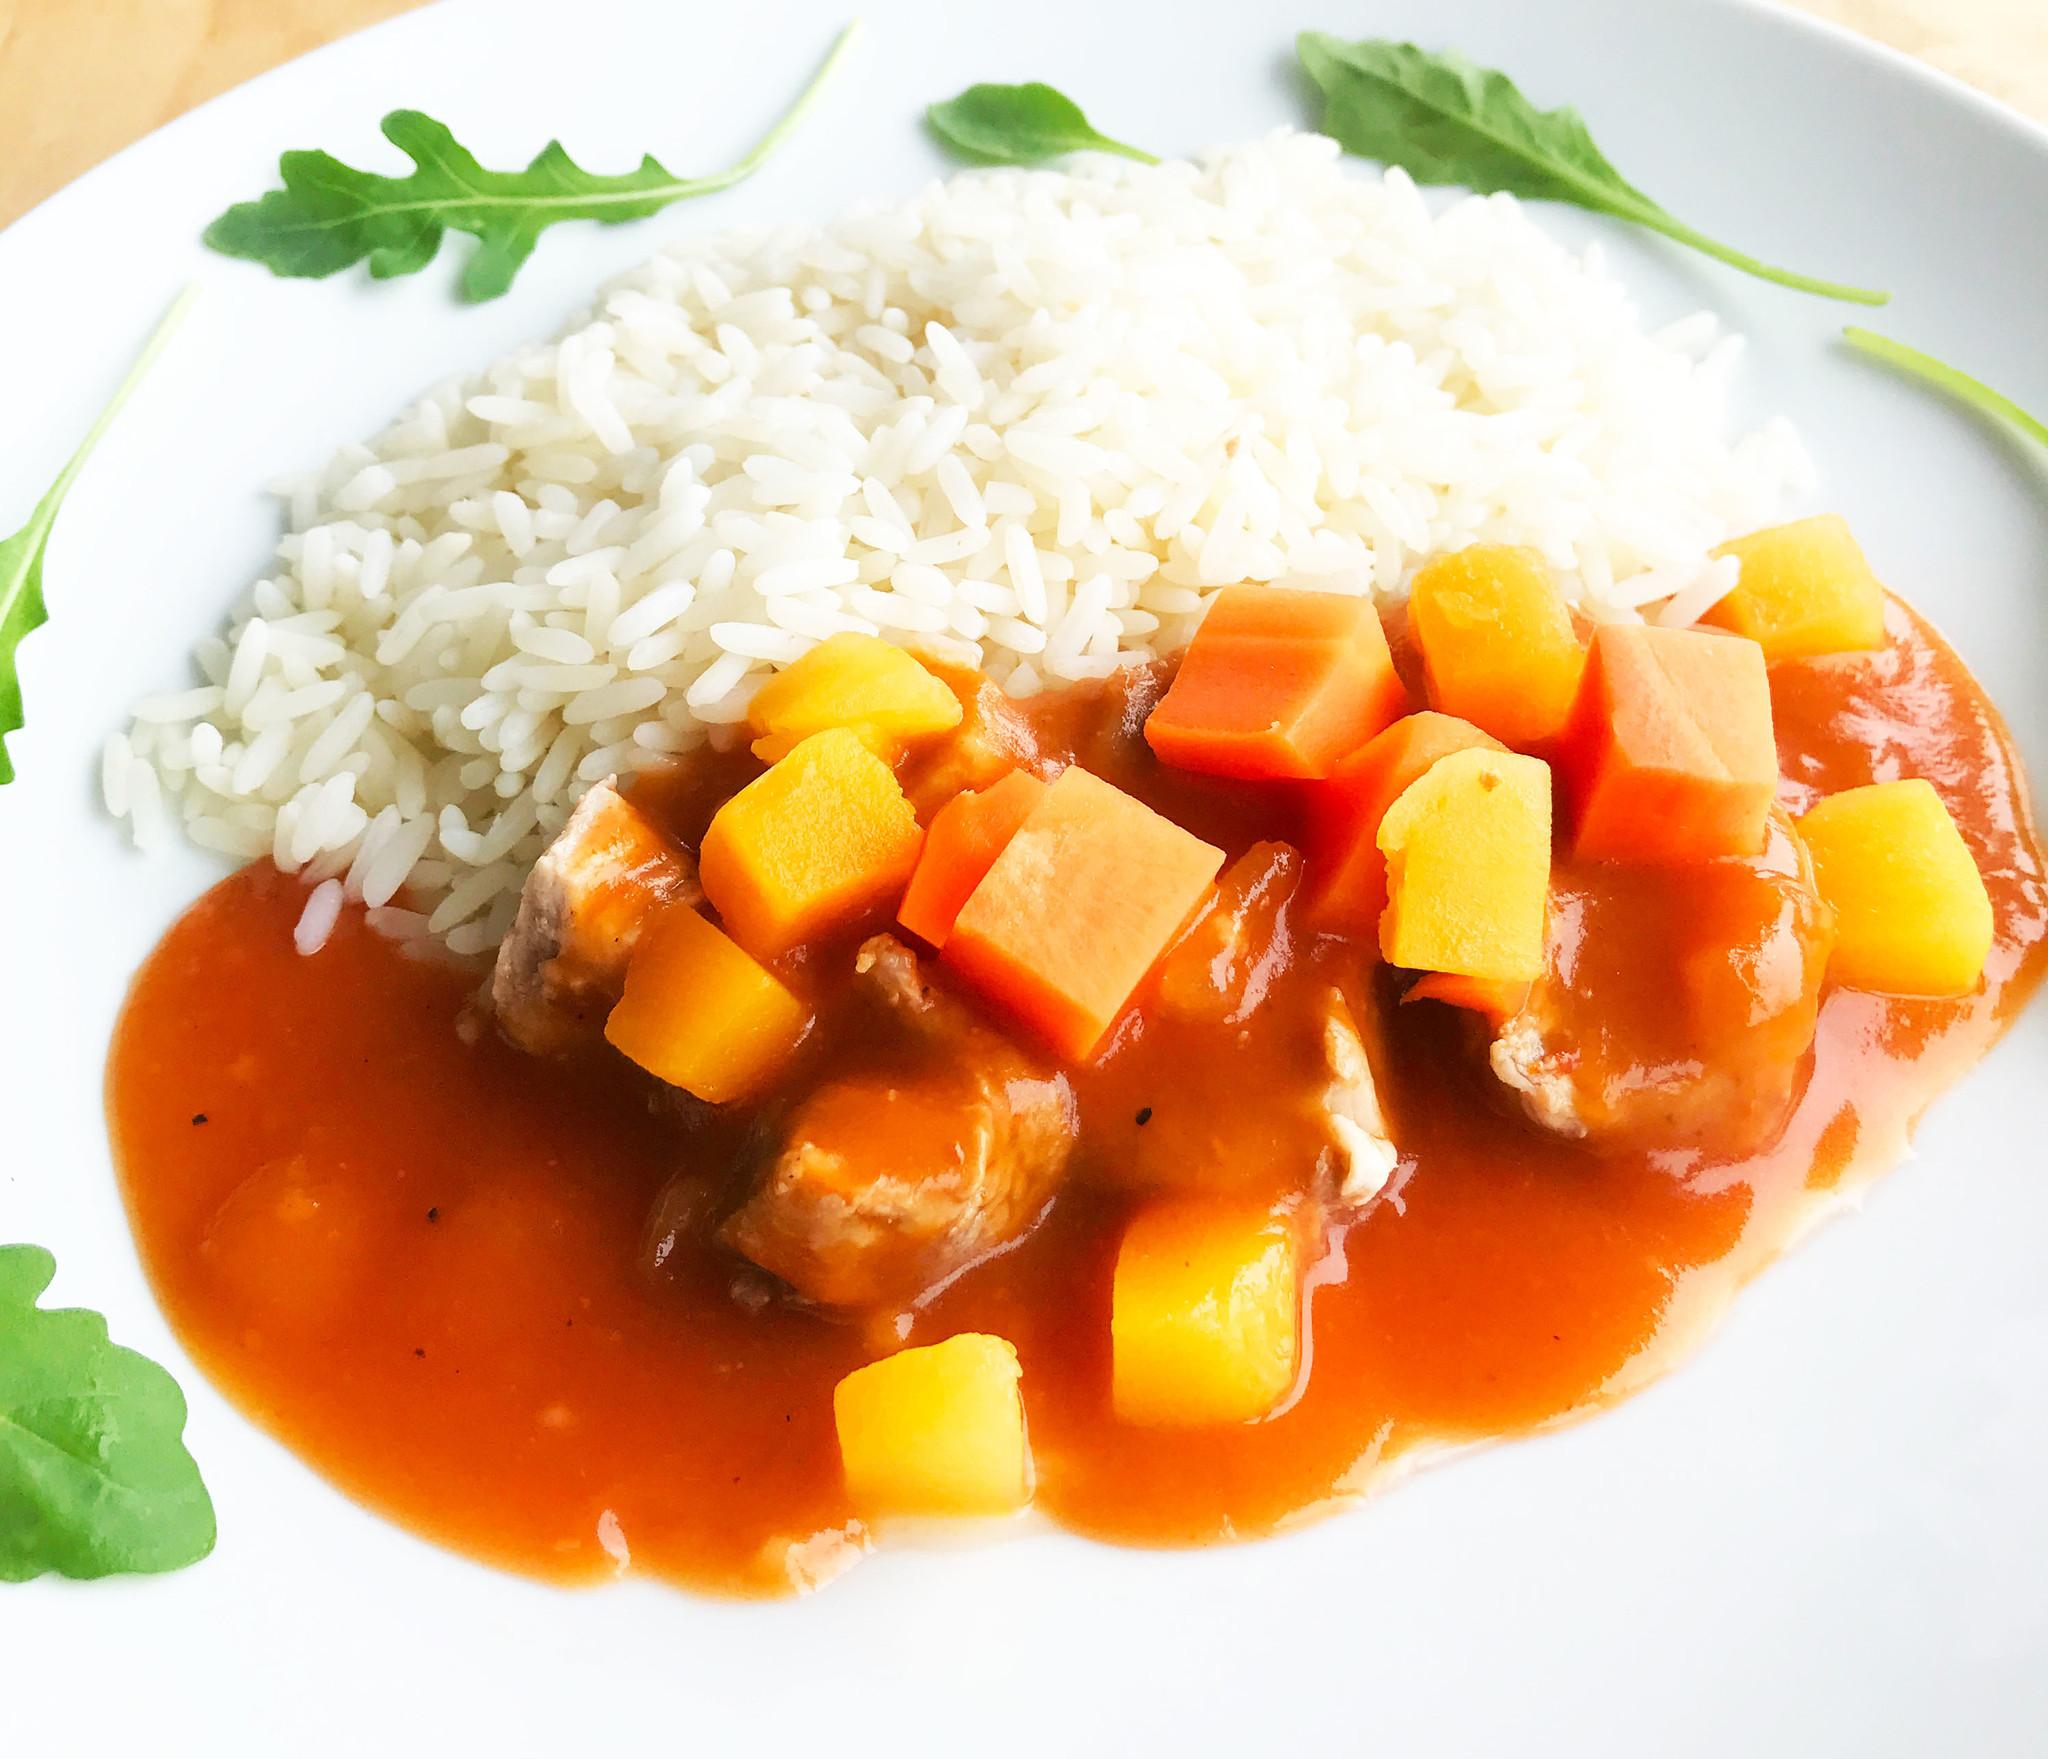 Pork tenderloin, BBQ sauce, vegetables & rice (325g)